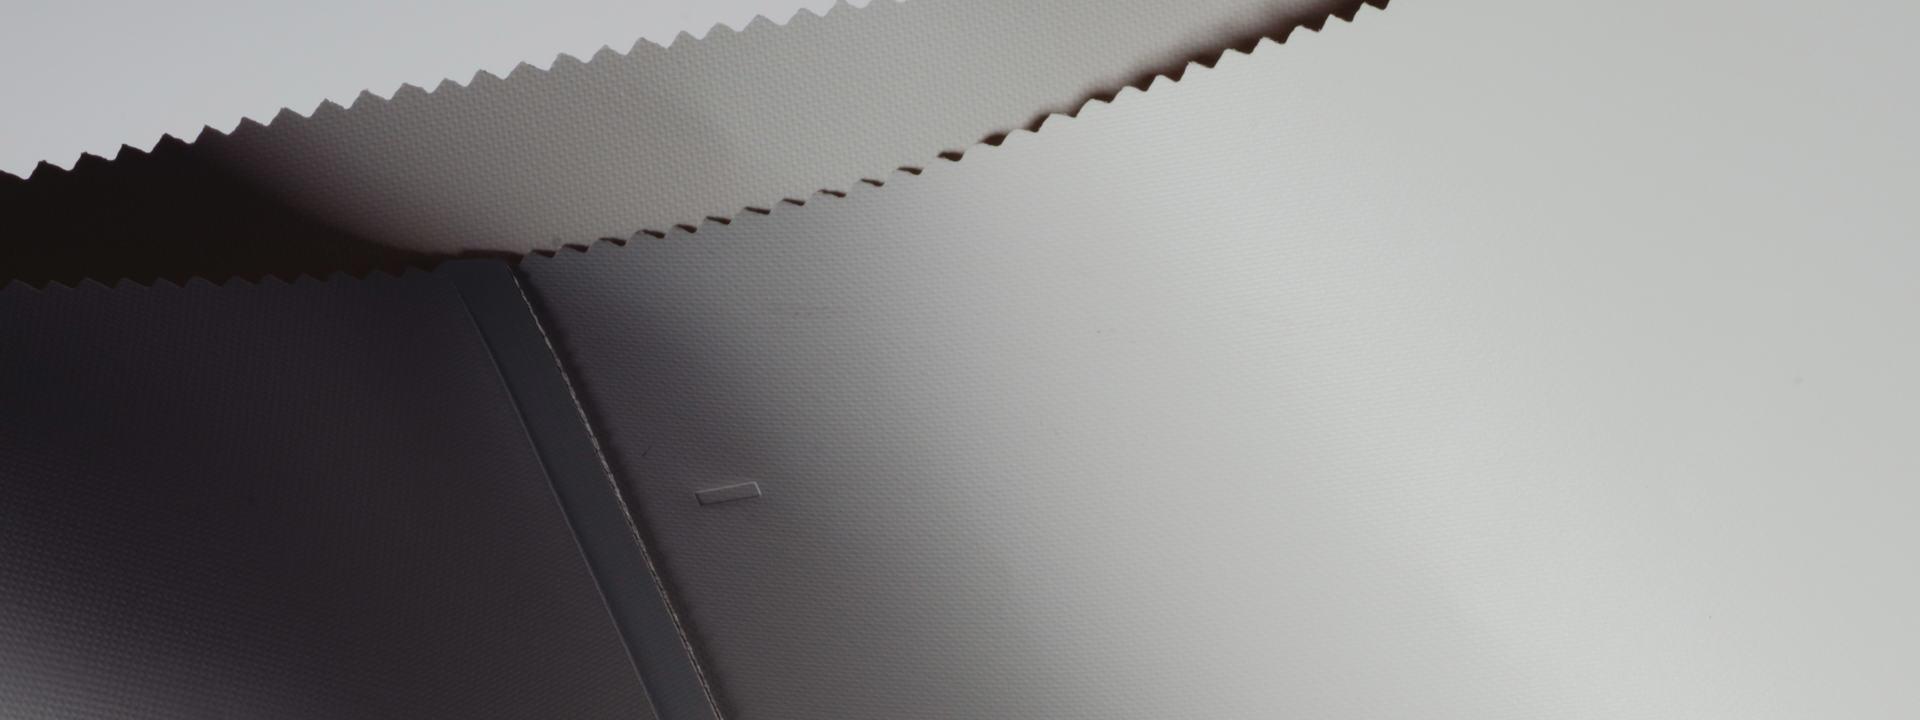 Roll-Up Bin M (30L), Office & Home, Storage, Container, Waste paper bin